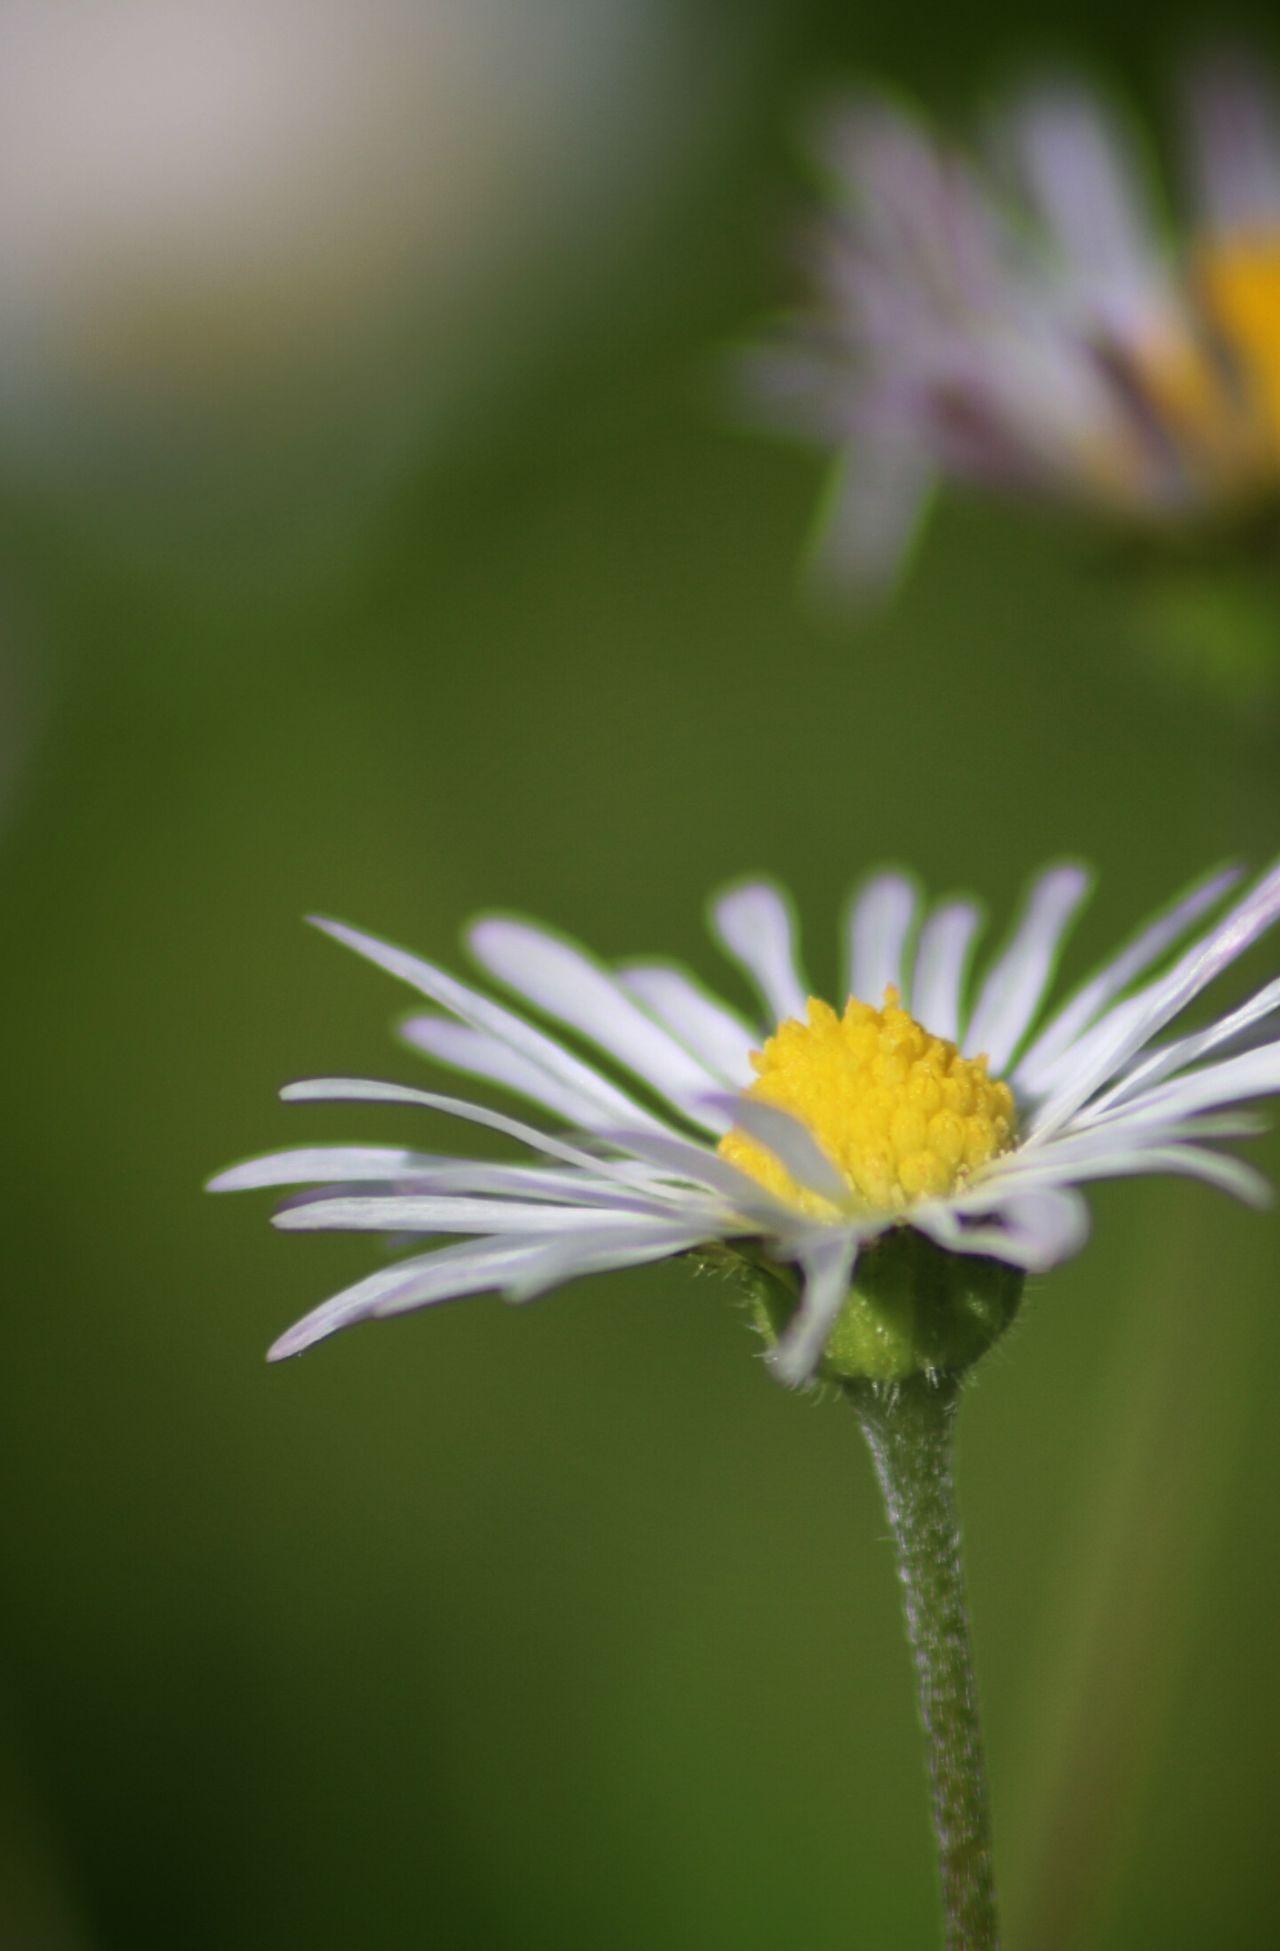 Nature Petals In Pink Petal Flowerporn Flower Daisy Daisy 🌼 Daisy Close Up